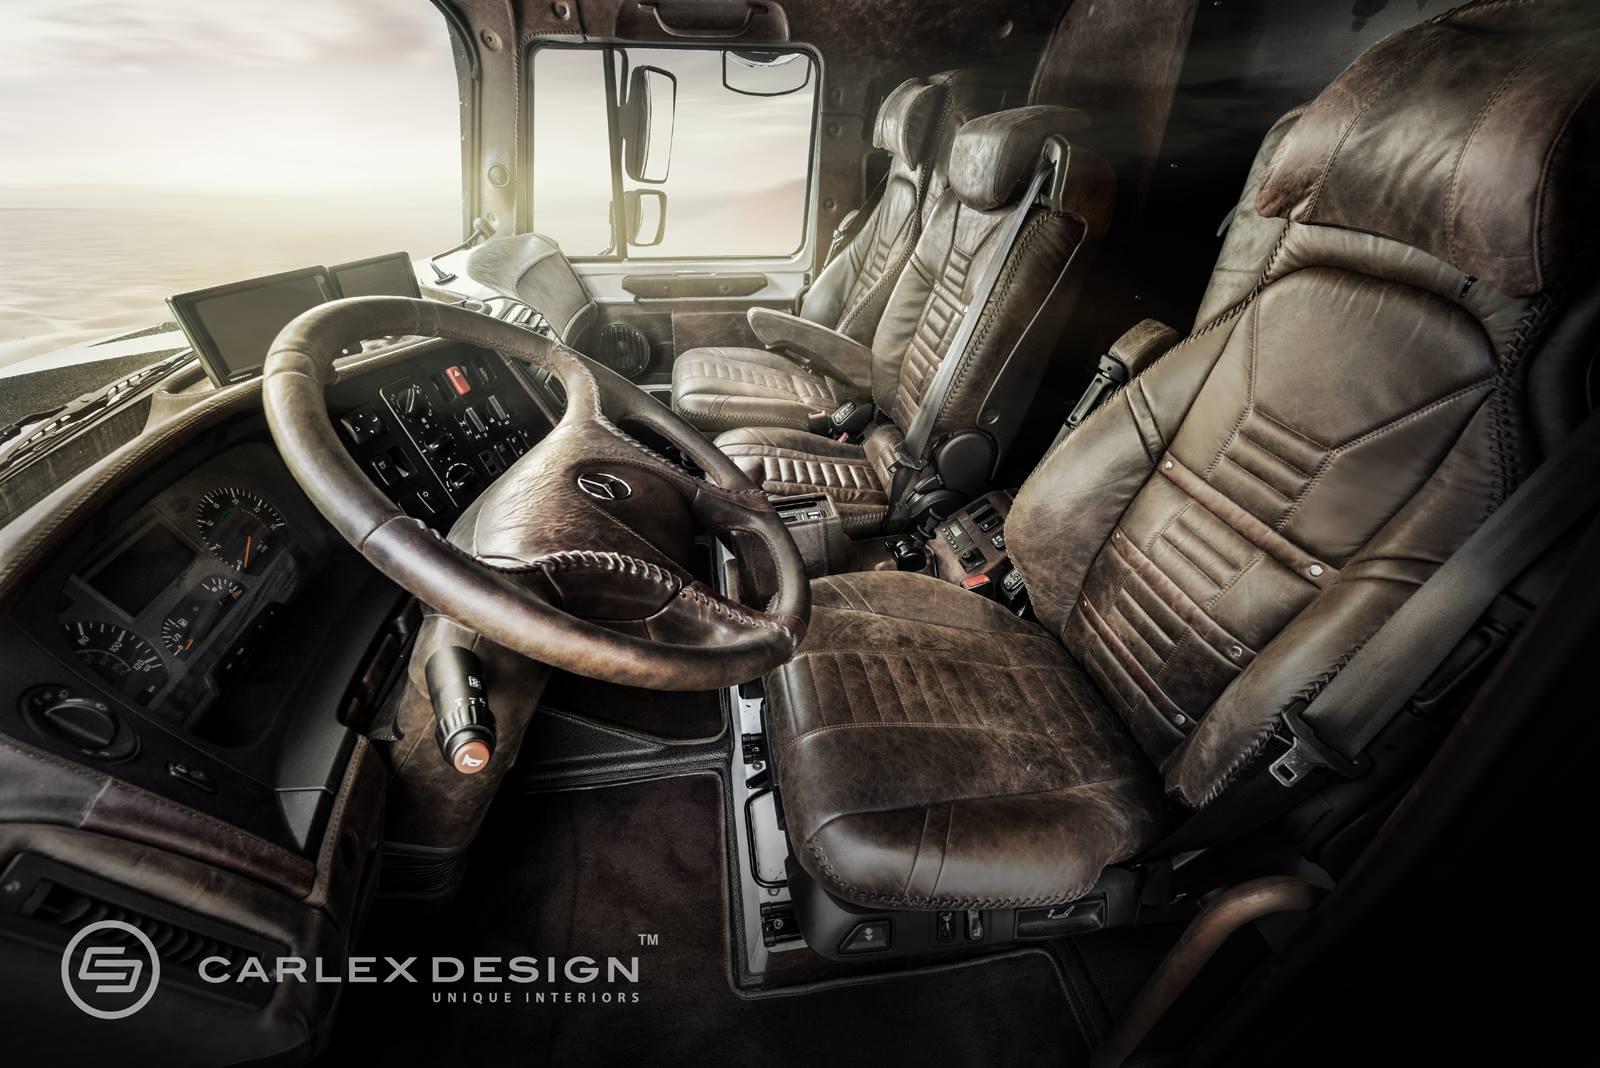 mercedes zetros gets desert themed luxury interior from